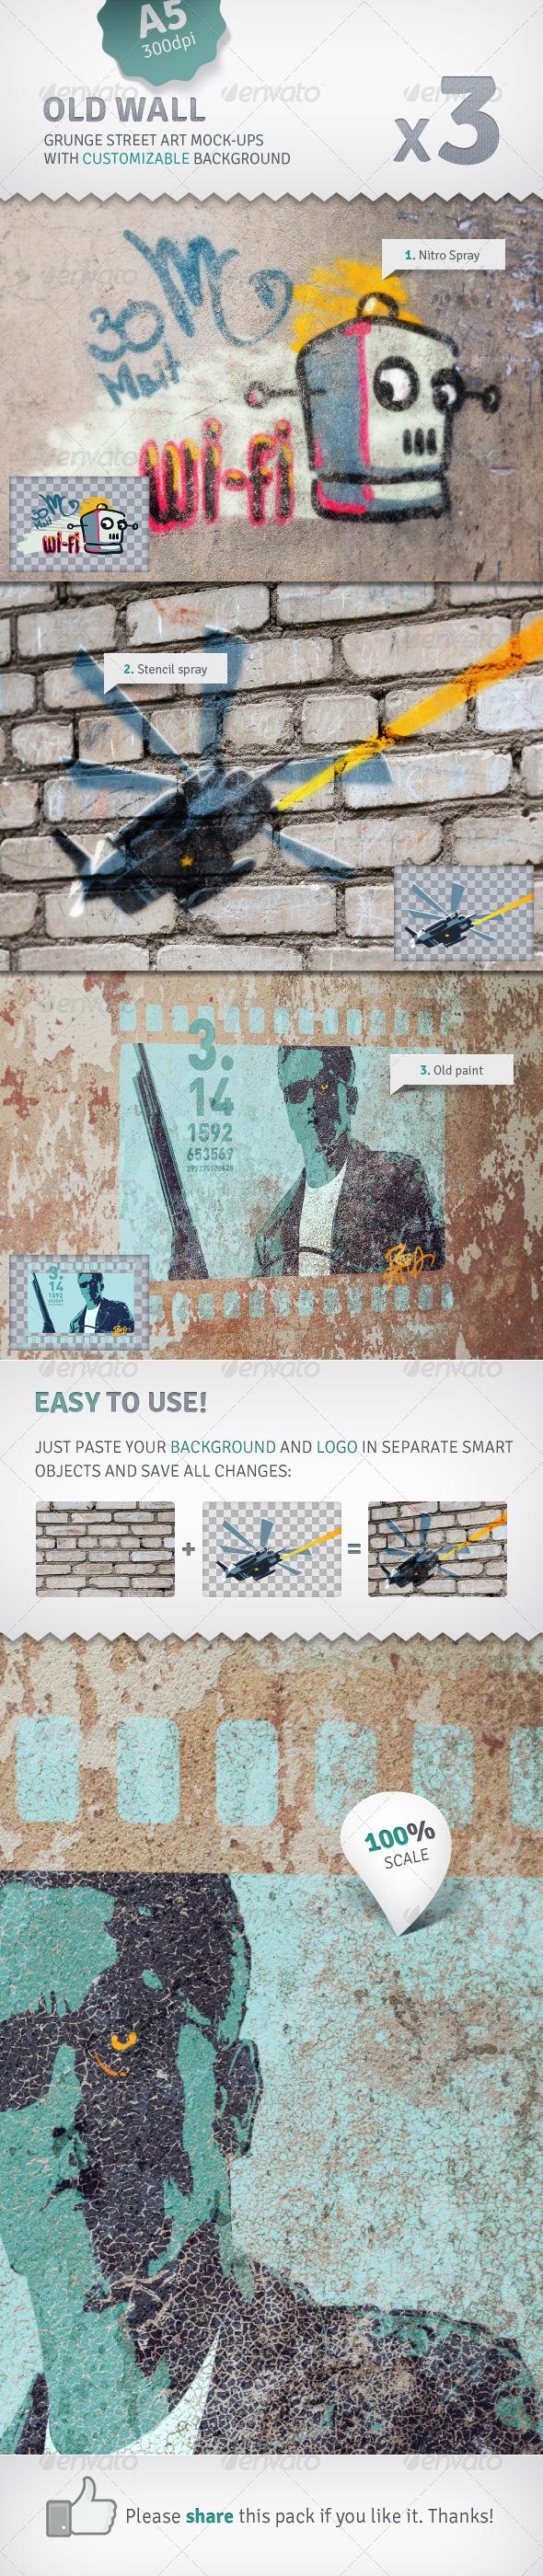 GraphicRiver Wall 3 Graffiti Street Art Mockups 2529449